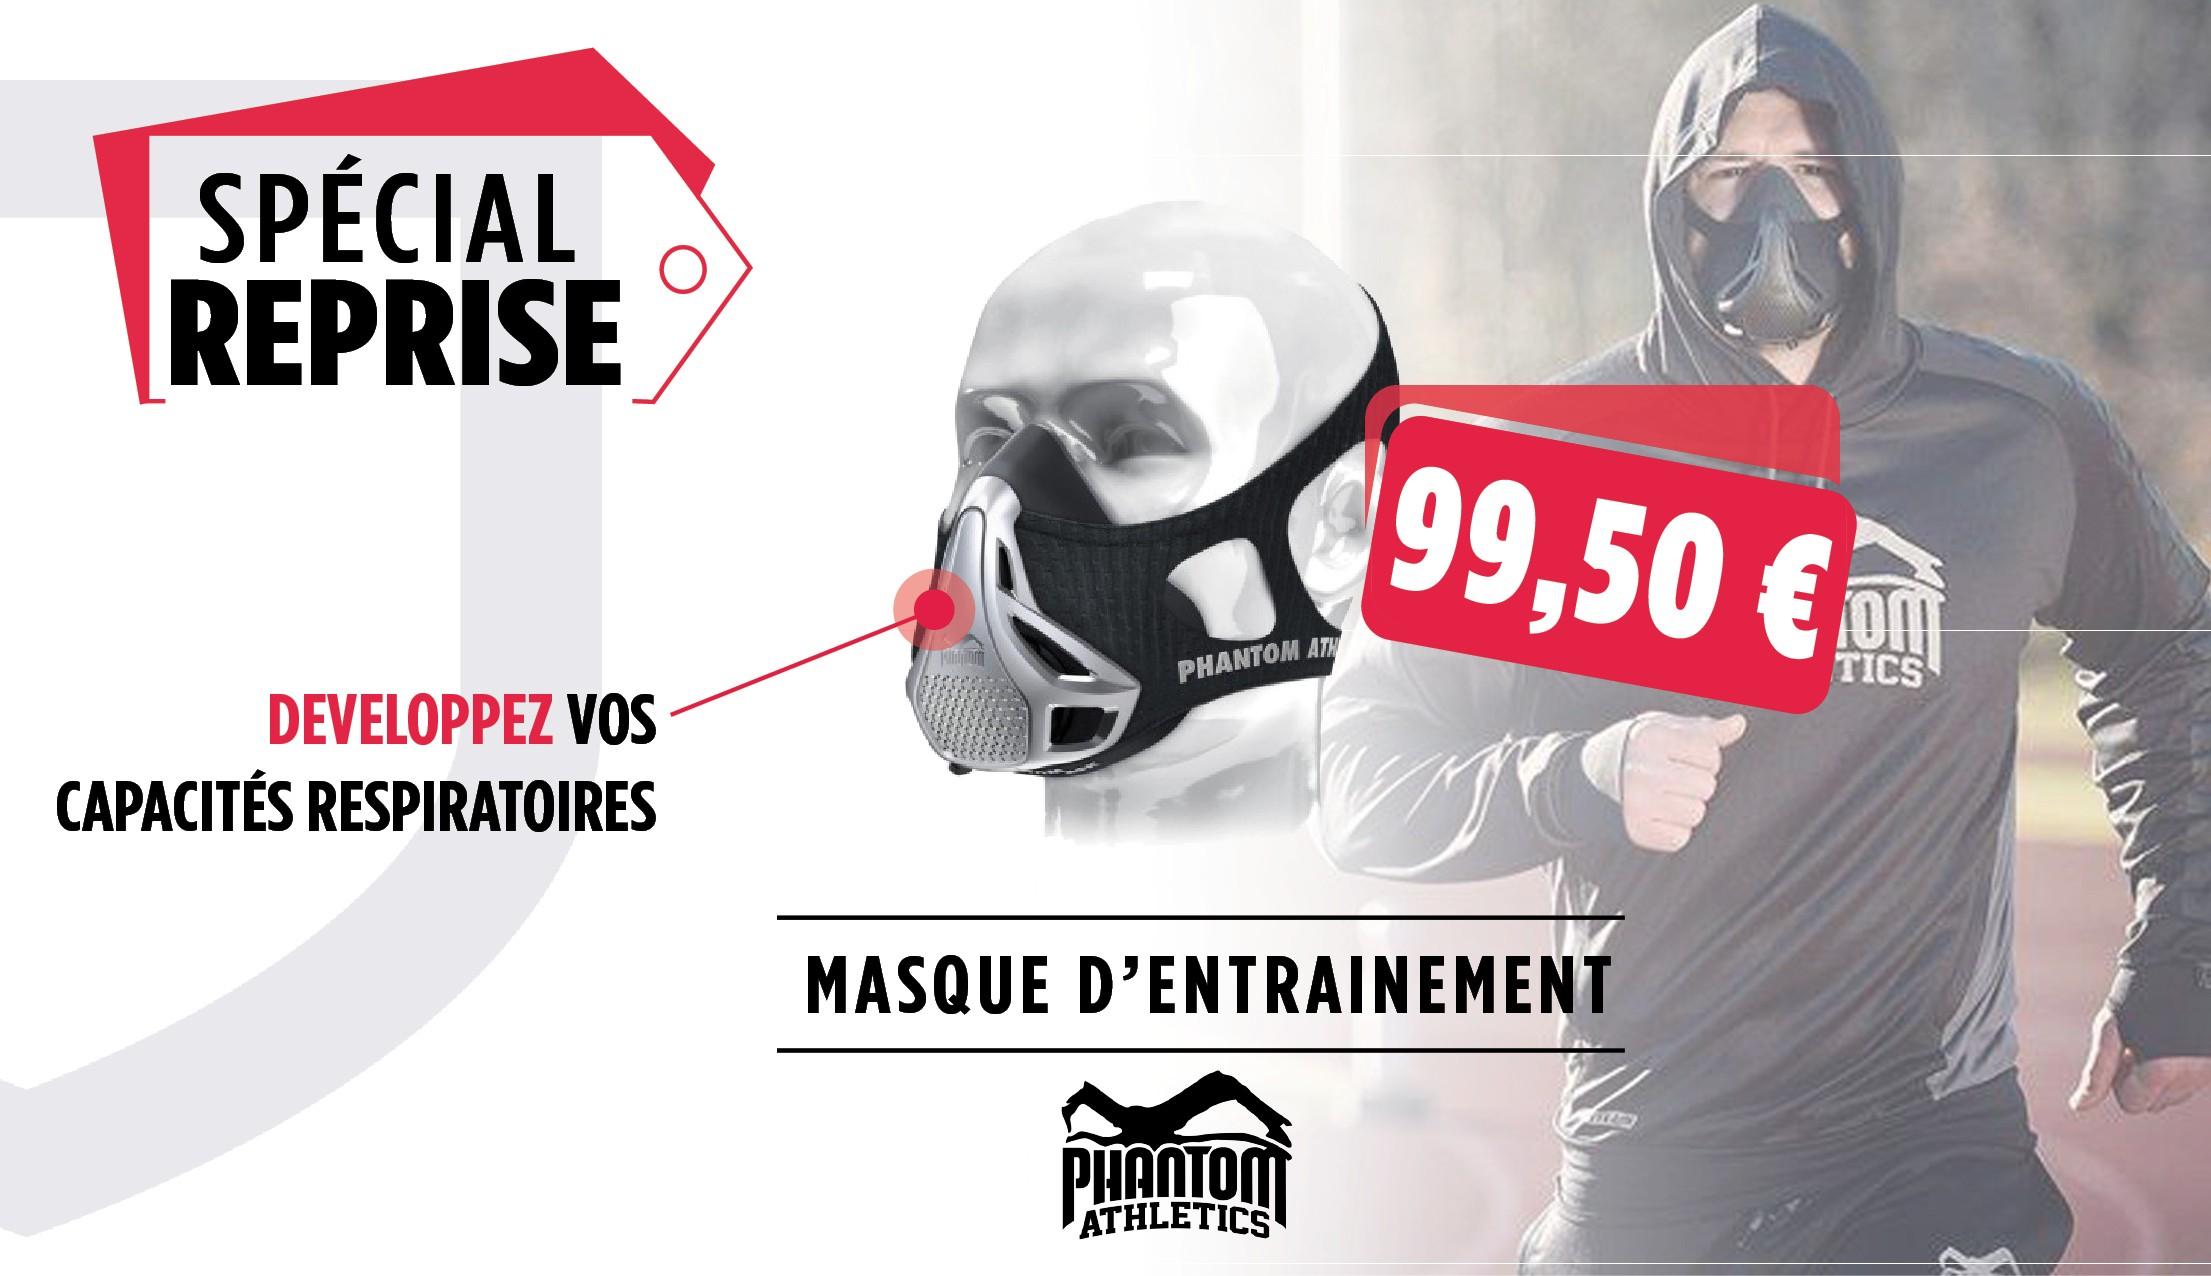 Masque d'entrainement - Phantom